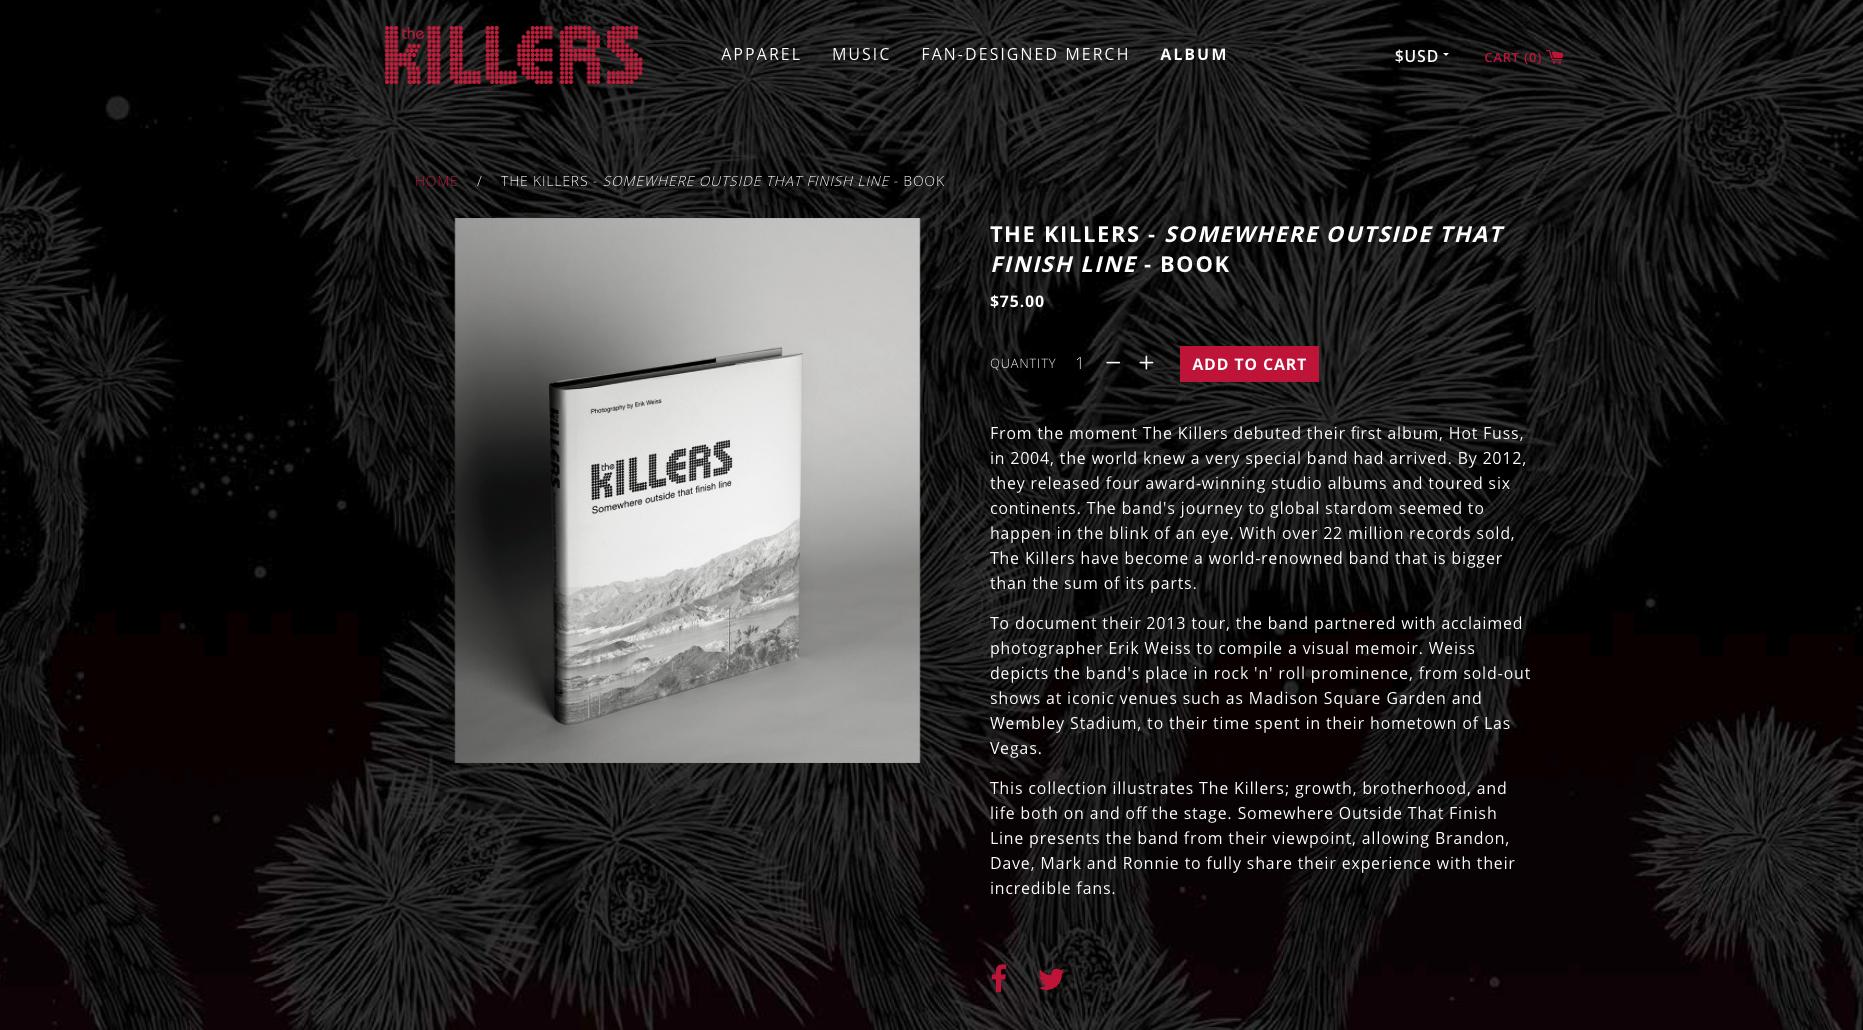 TheKillers_Book2018.jpg